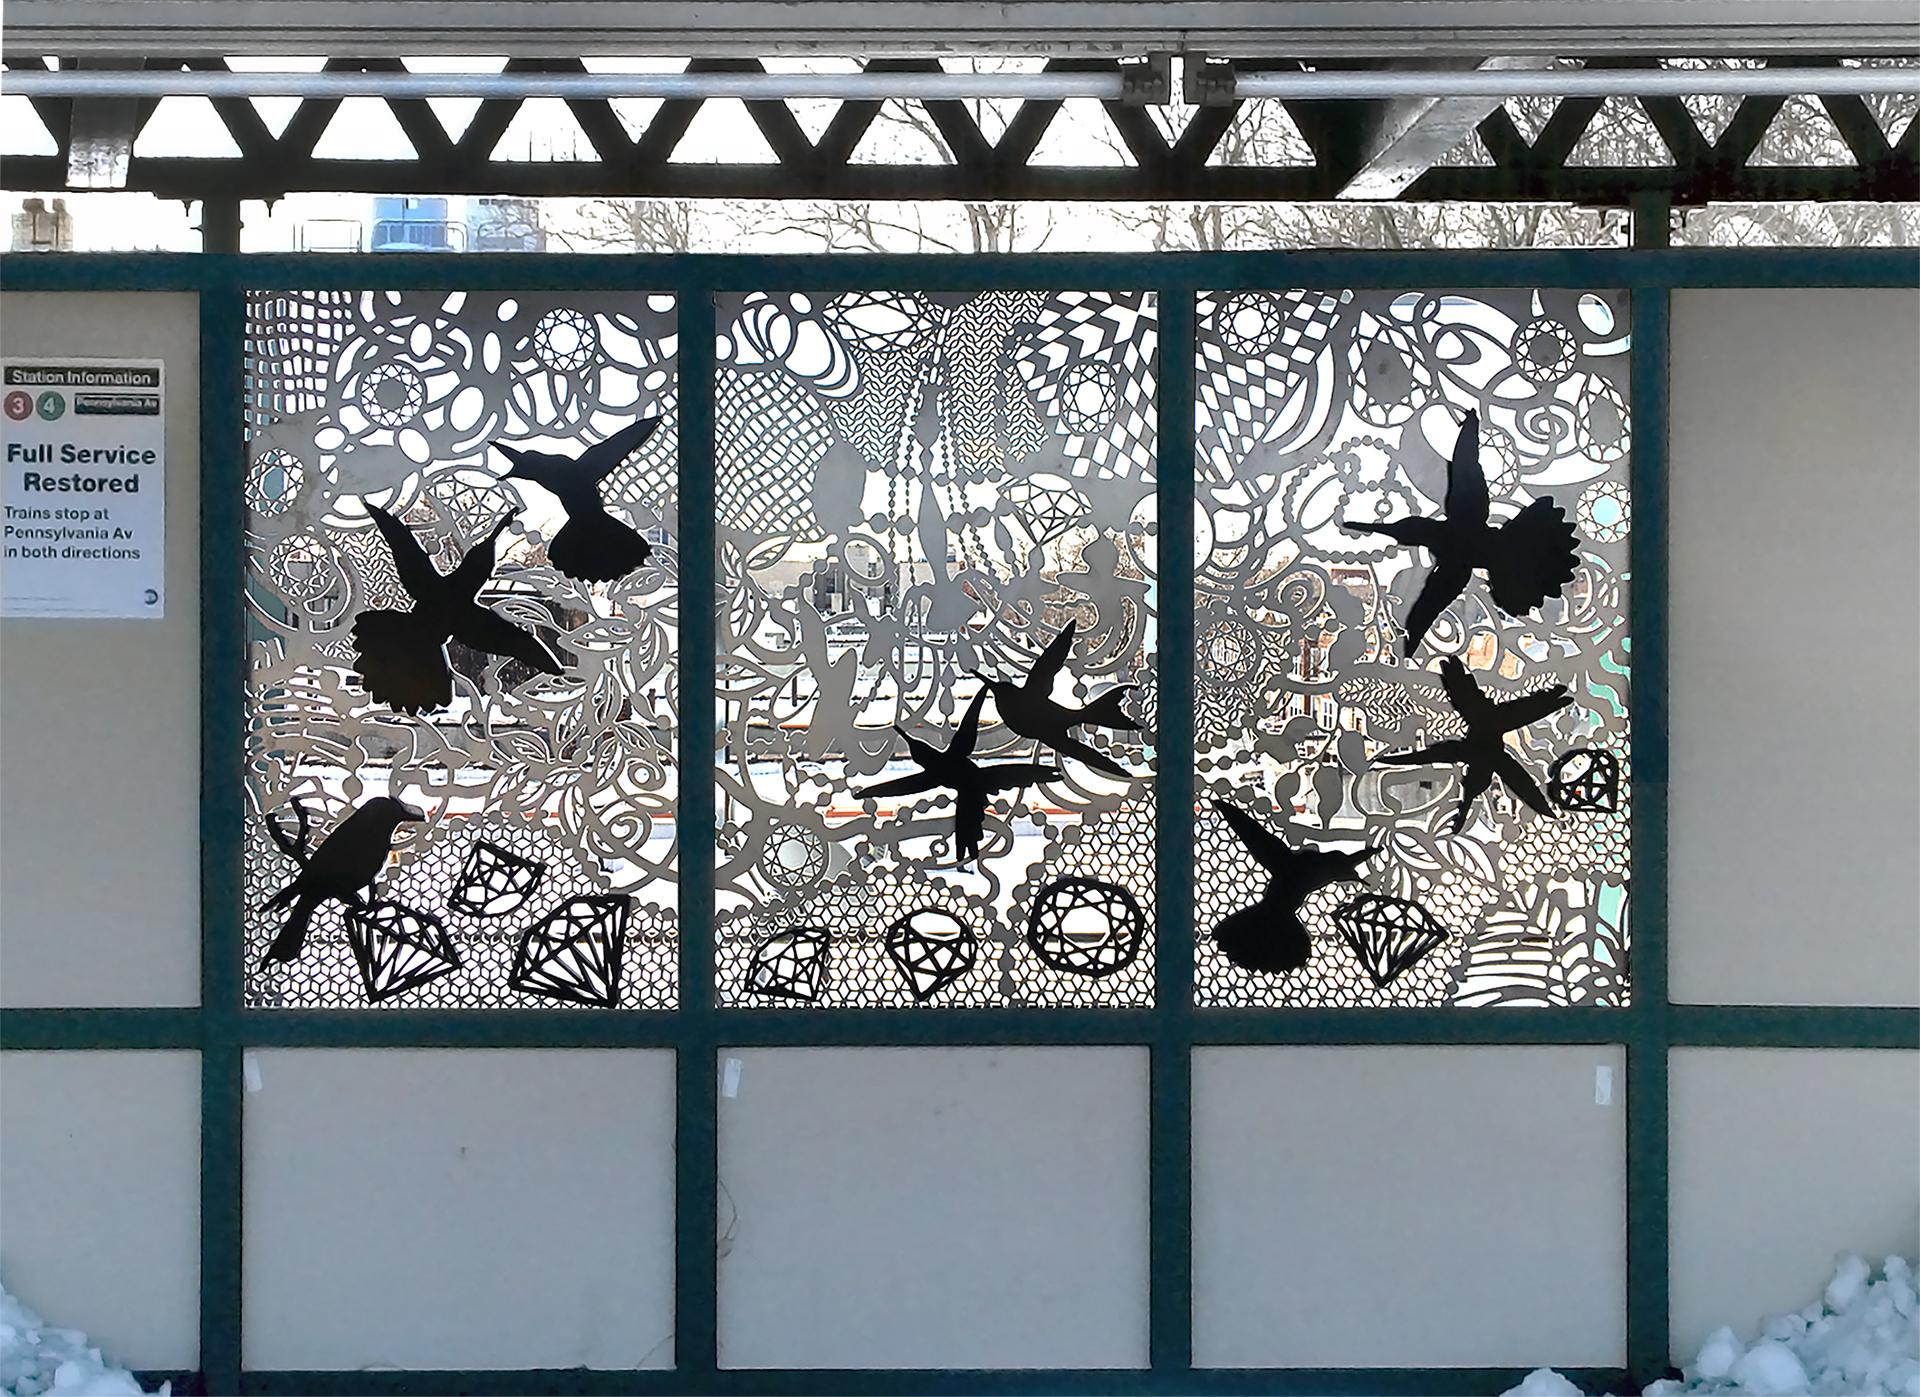 Nancy Baker_mta subway art